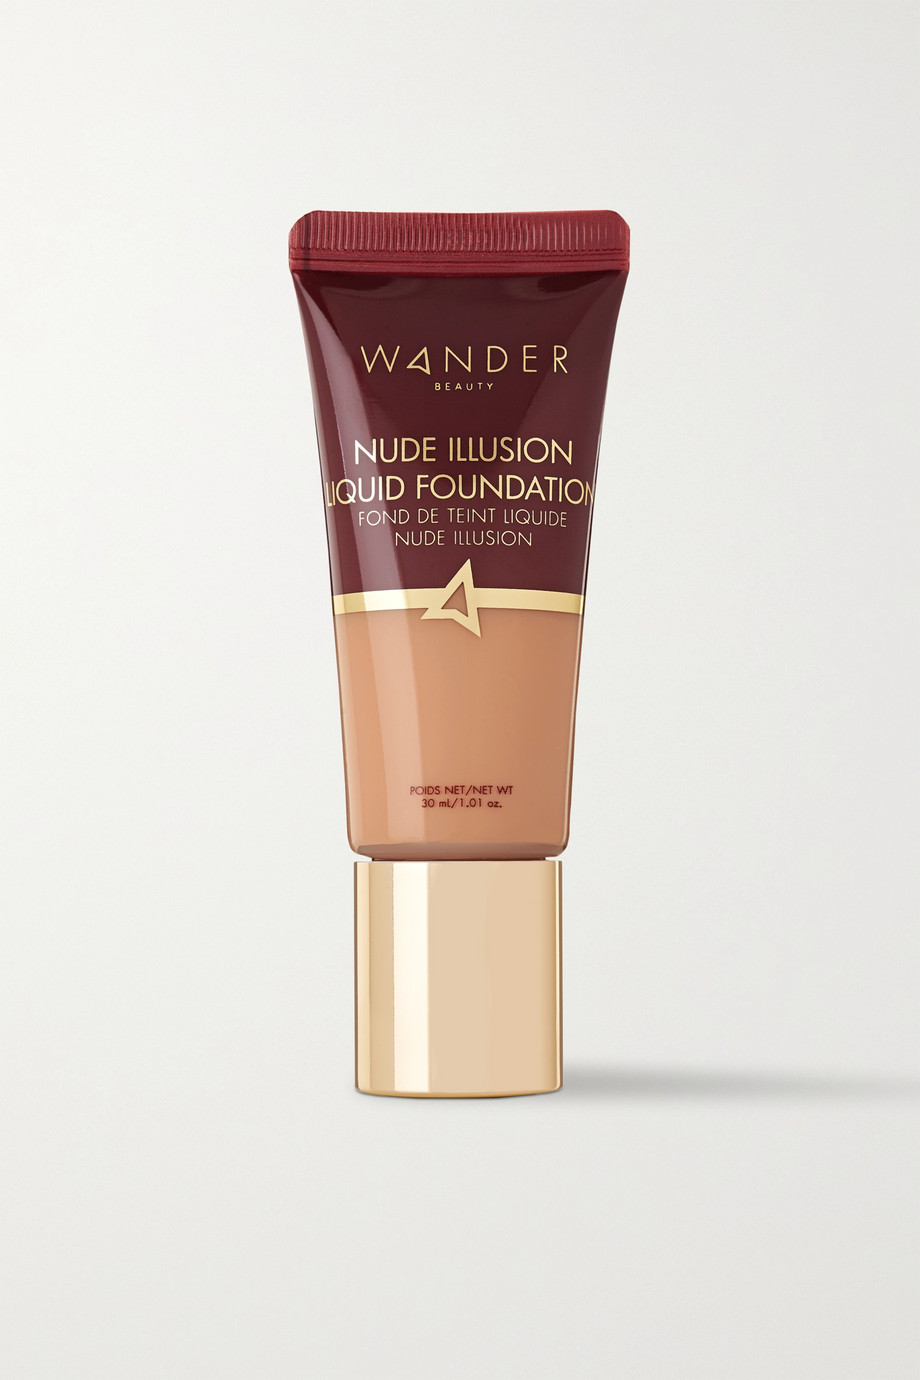 Wander Beauty Nude Illusion Liquid Foundation - Light Medium